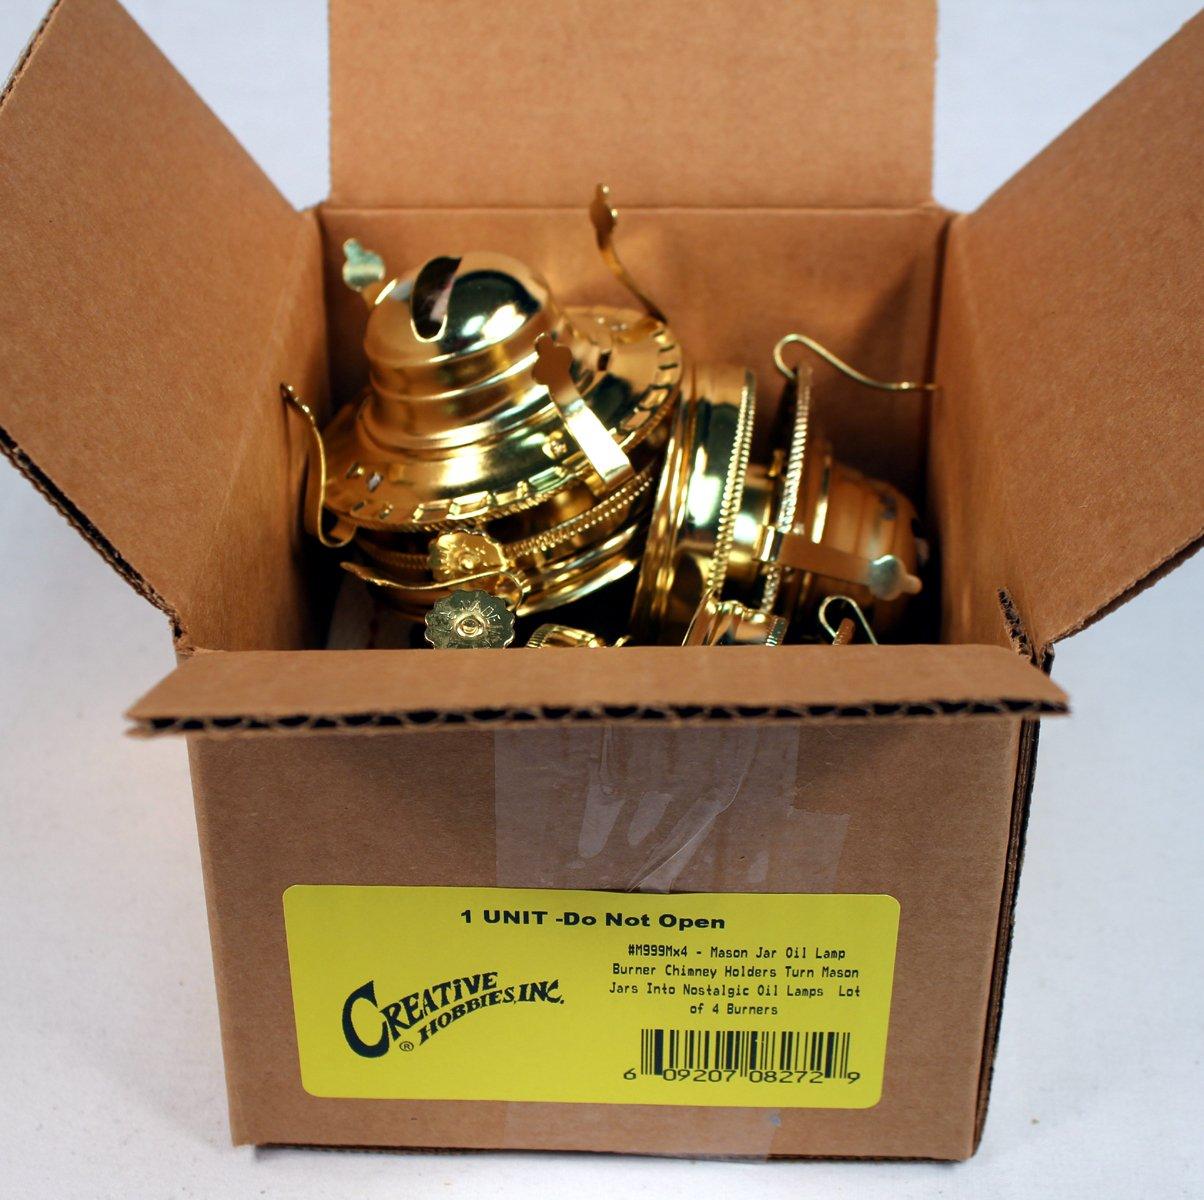 Creative Hobbies Mason Jar Oil Lamp Burner Chimney Holders Turn Mason Jars Into Nostalgic Oil Lamps ~Lot of 4 Burners